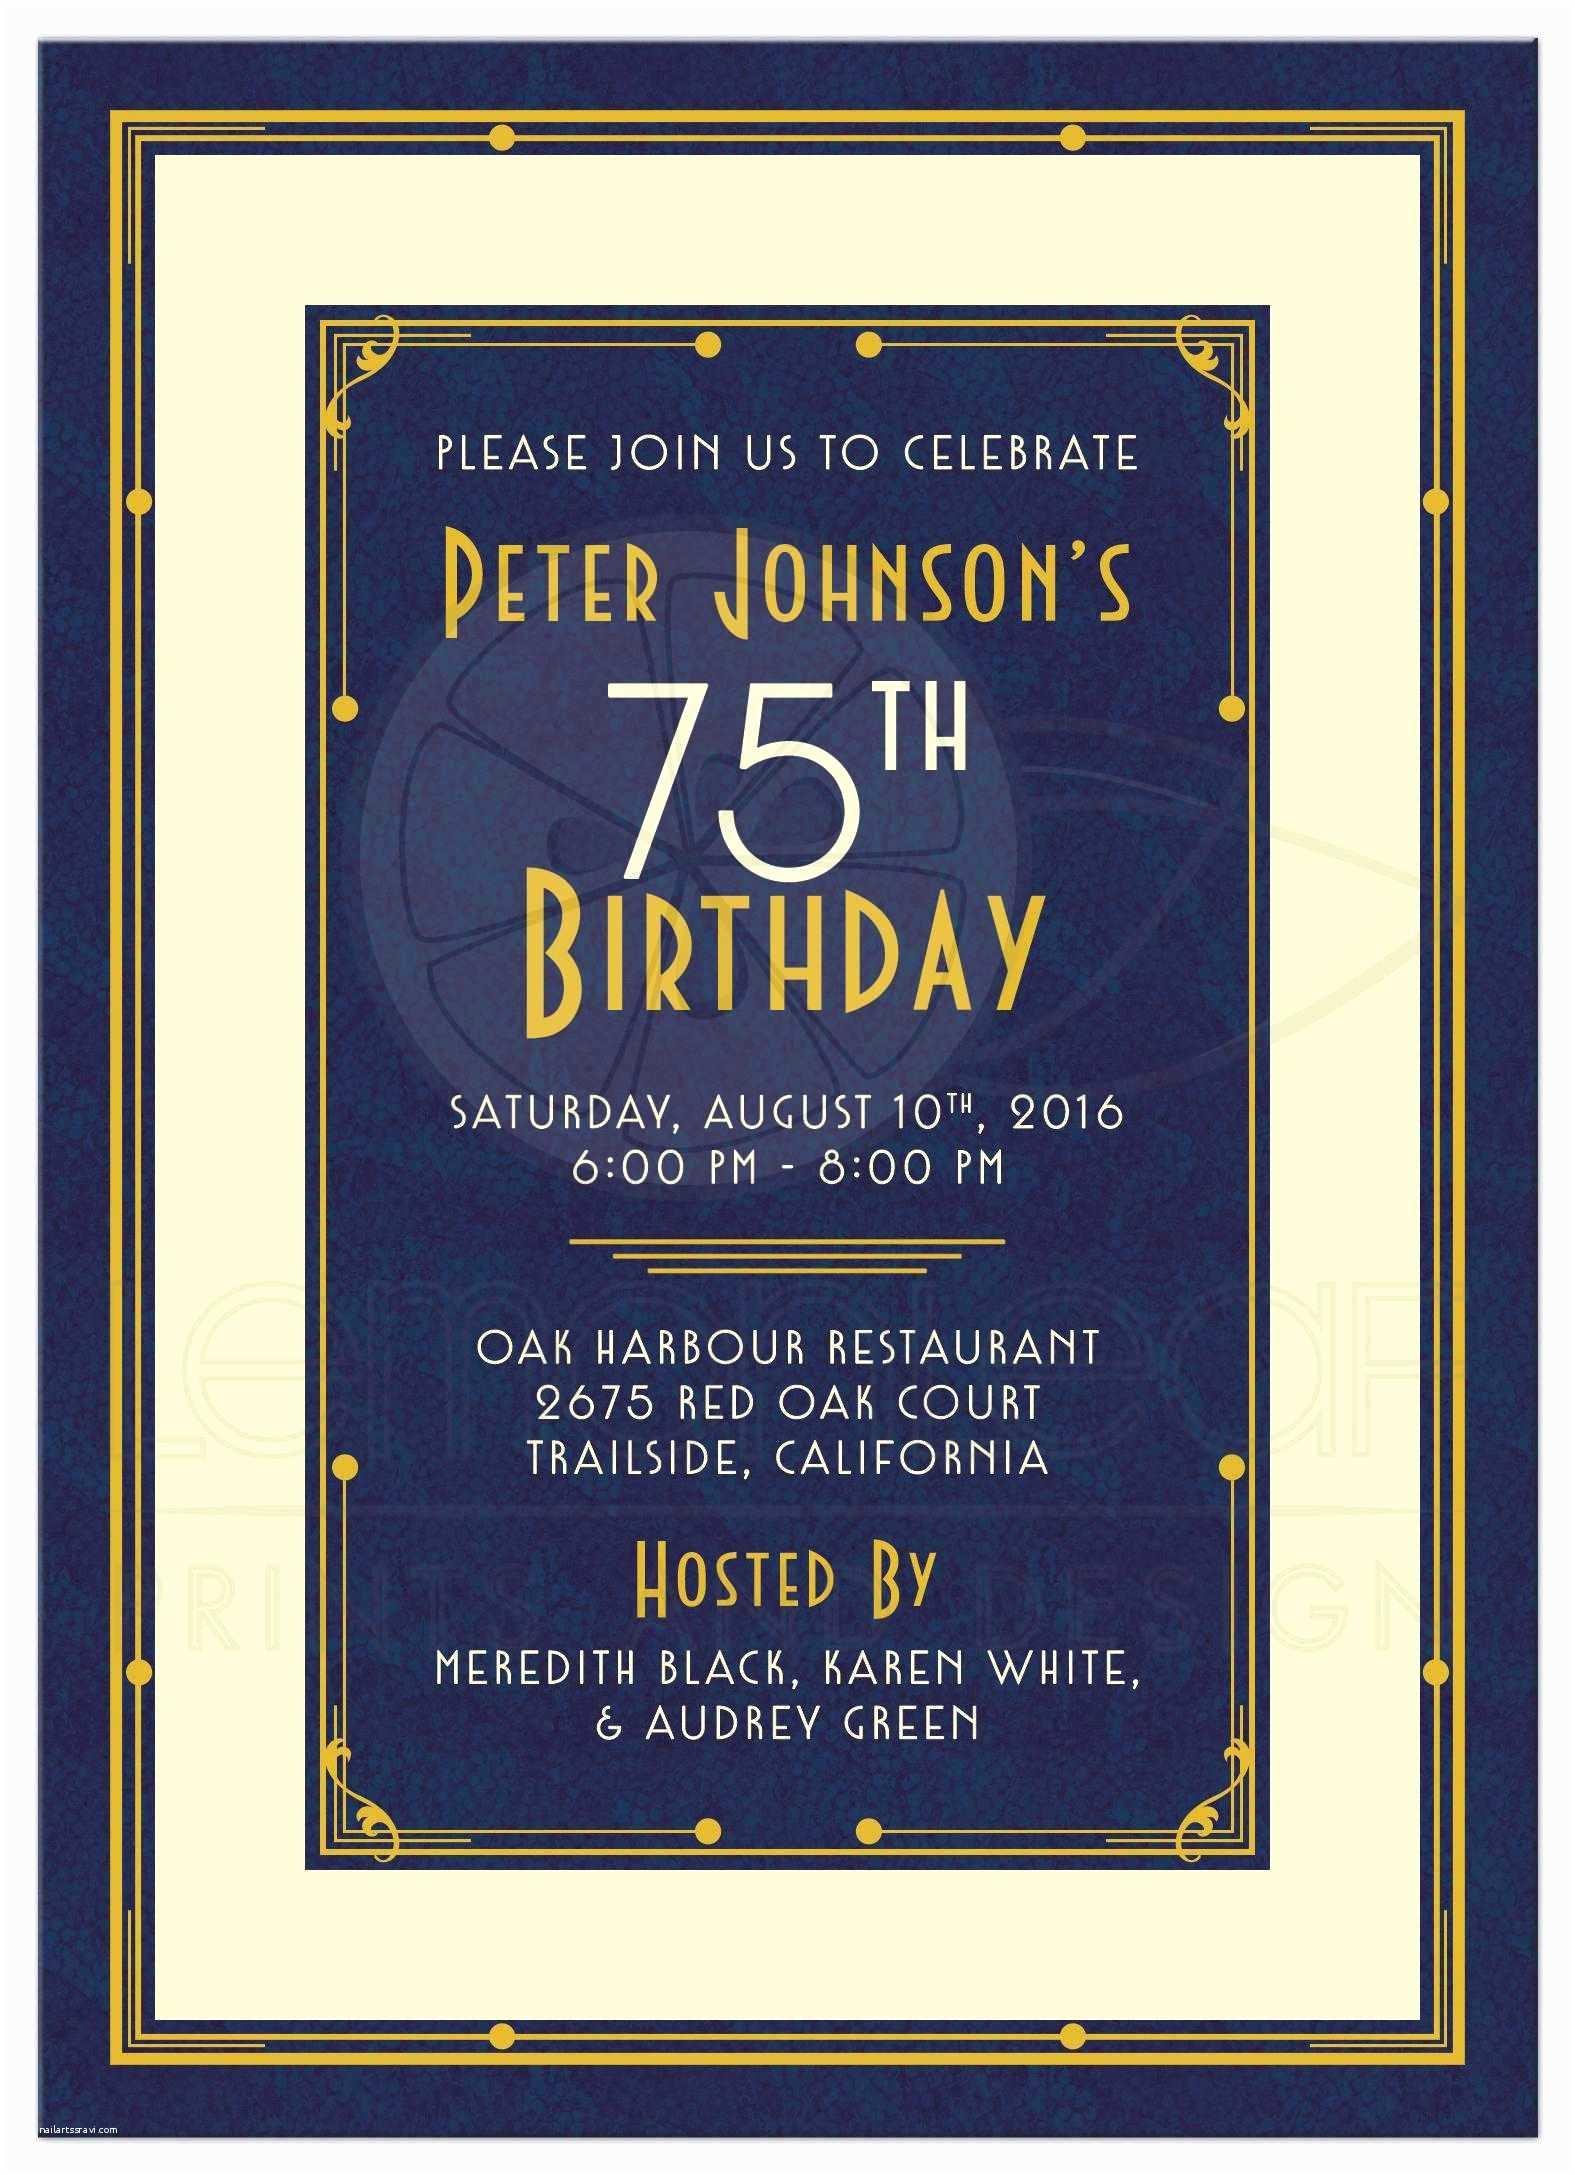 75th birthday party invitations 16 75th birthday invitations unique